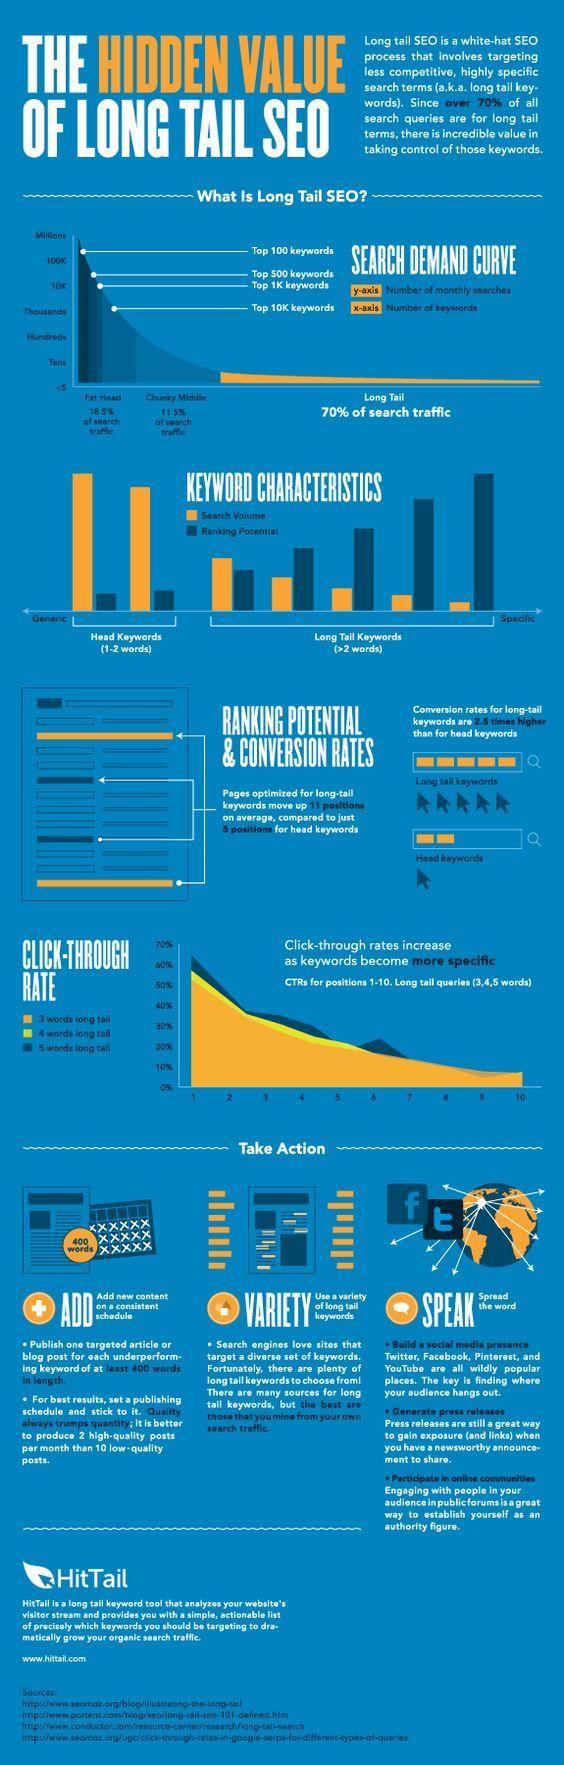 1517 best Digital market images on Pinterest | Social media ...